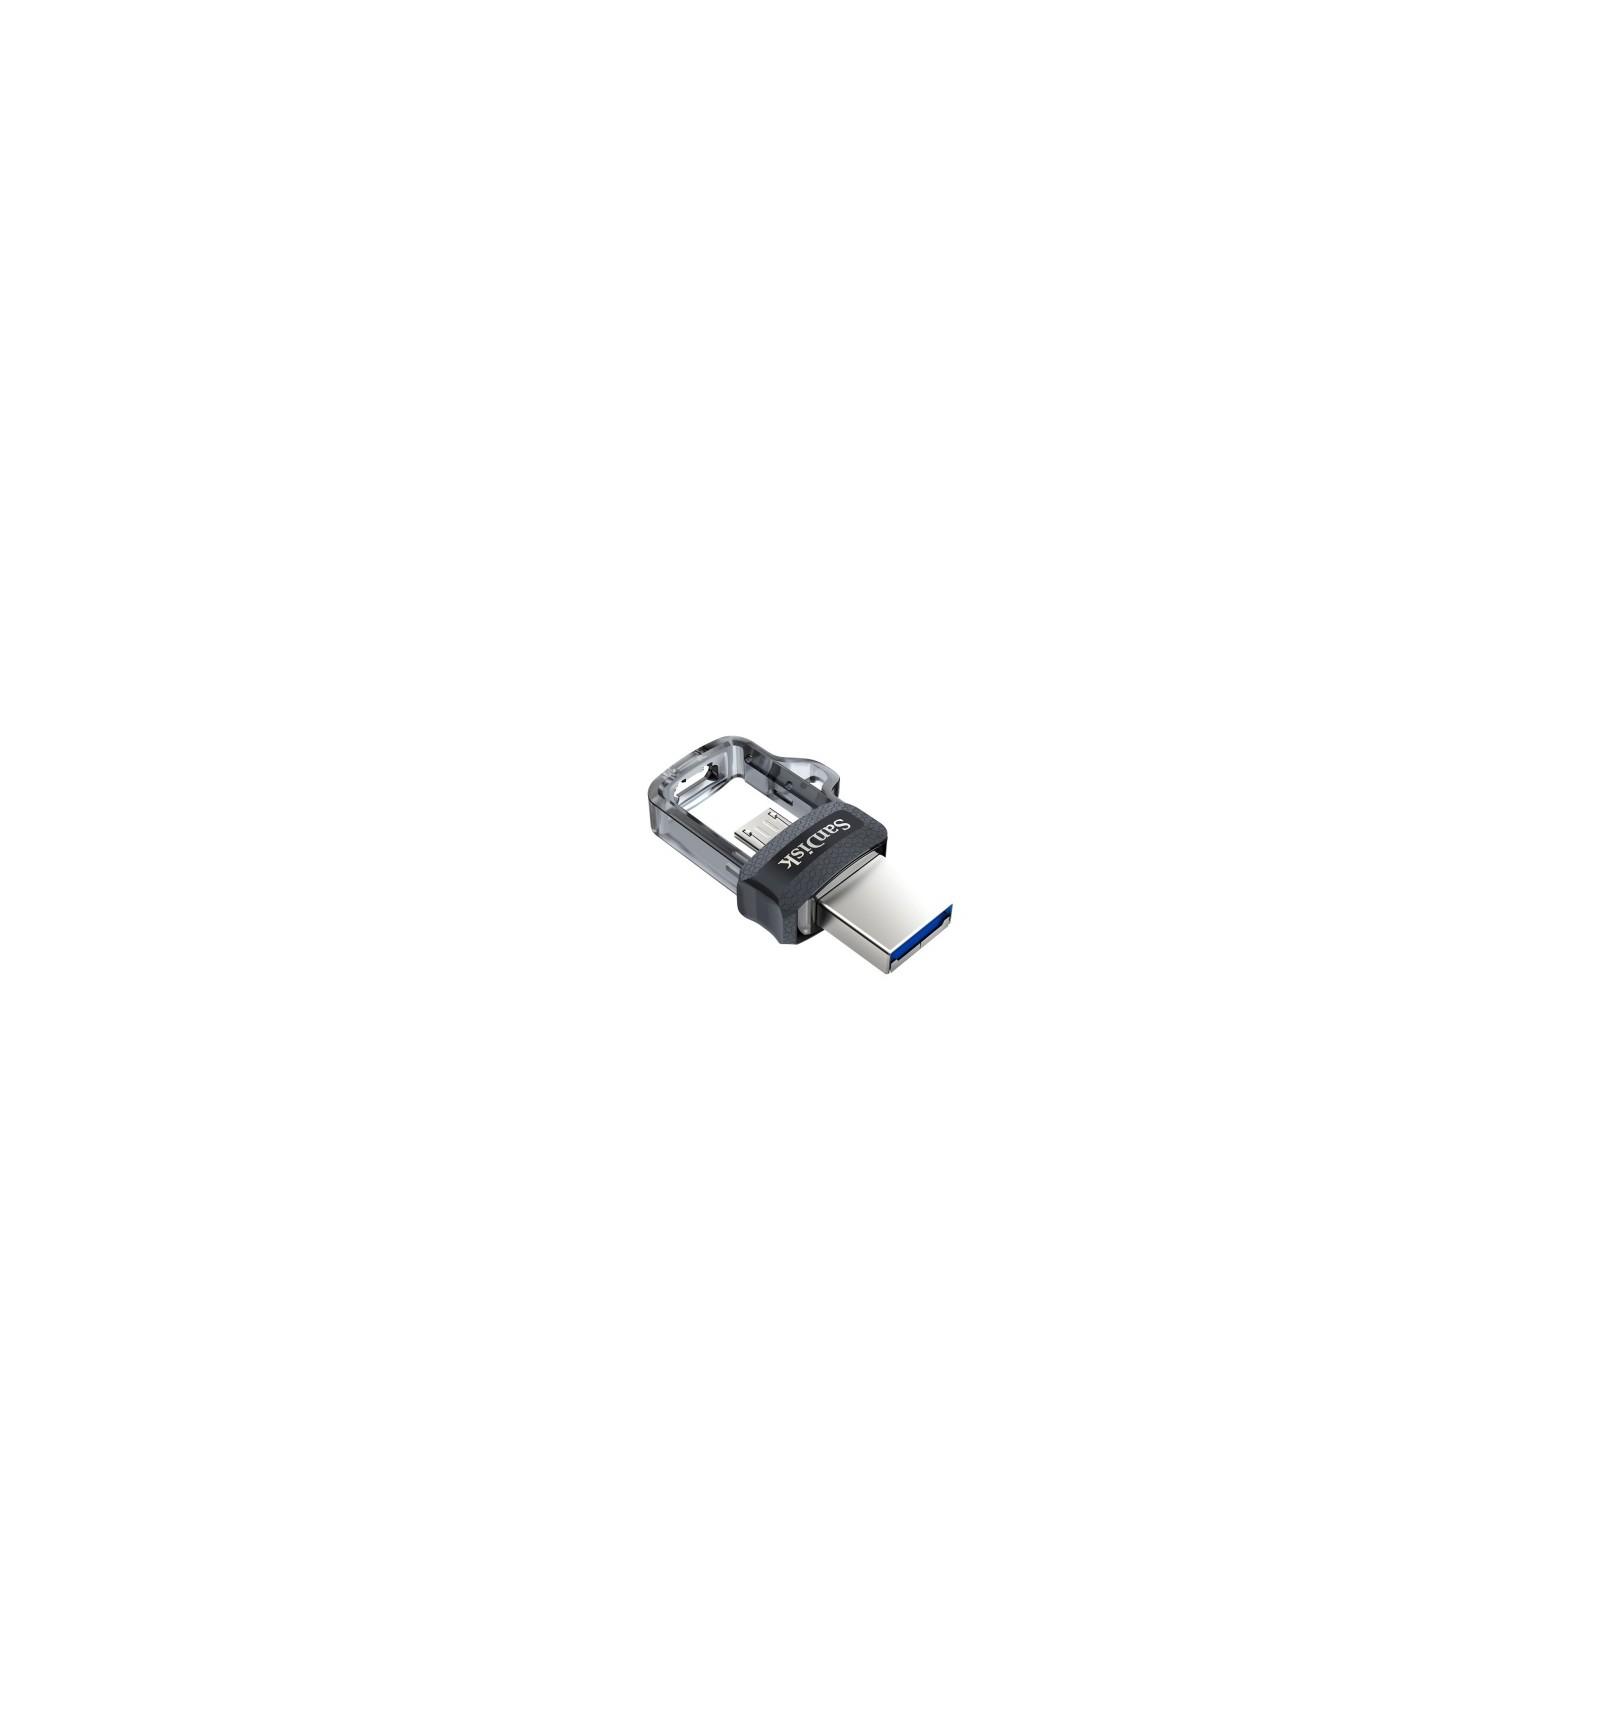 Pendrive Otg 16 Gb Usb 30 Sandisk Dual Drive M30 Technology 32gb Ultra